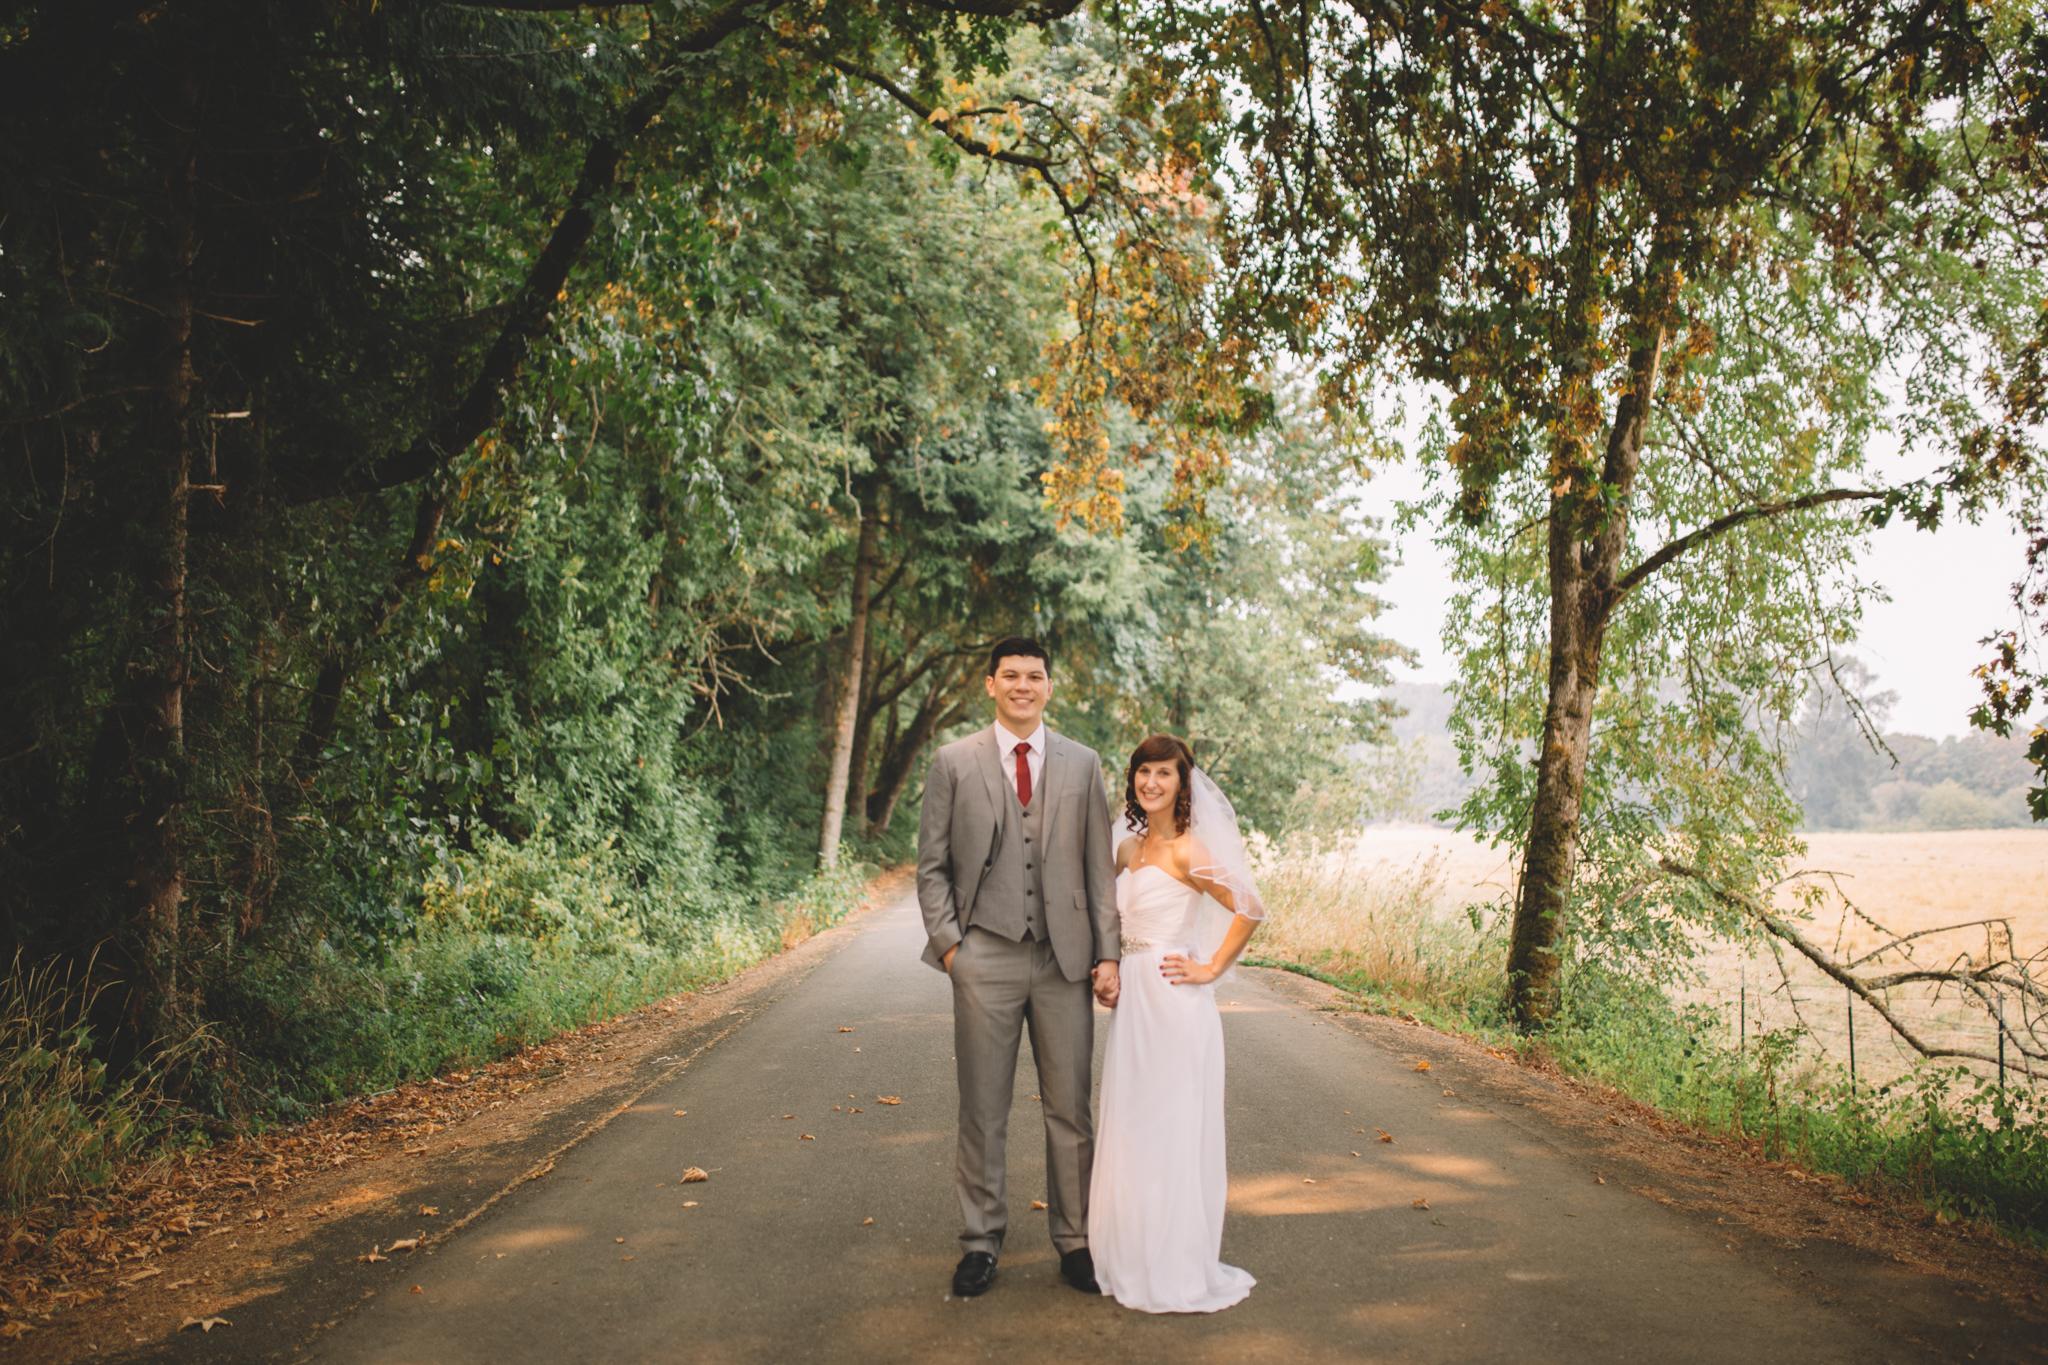 SeattleWeddingPhotographer -2.jpg